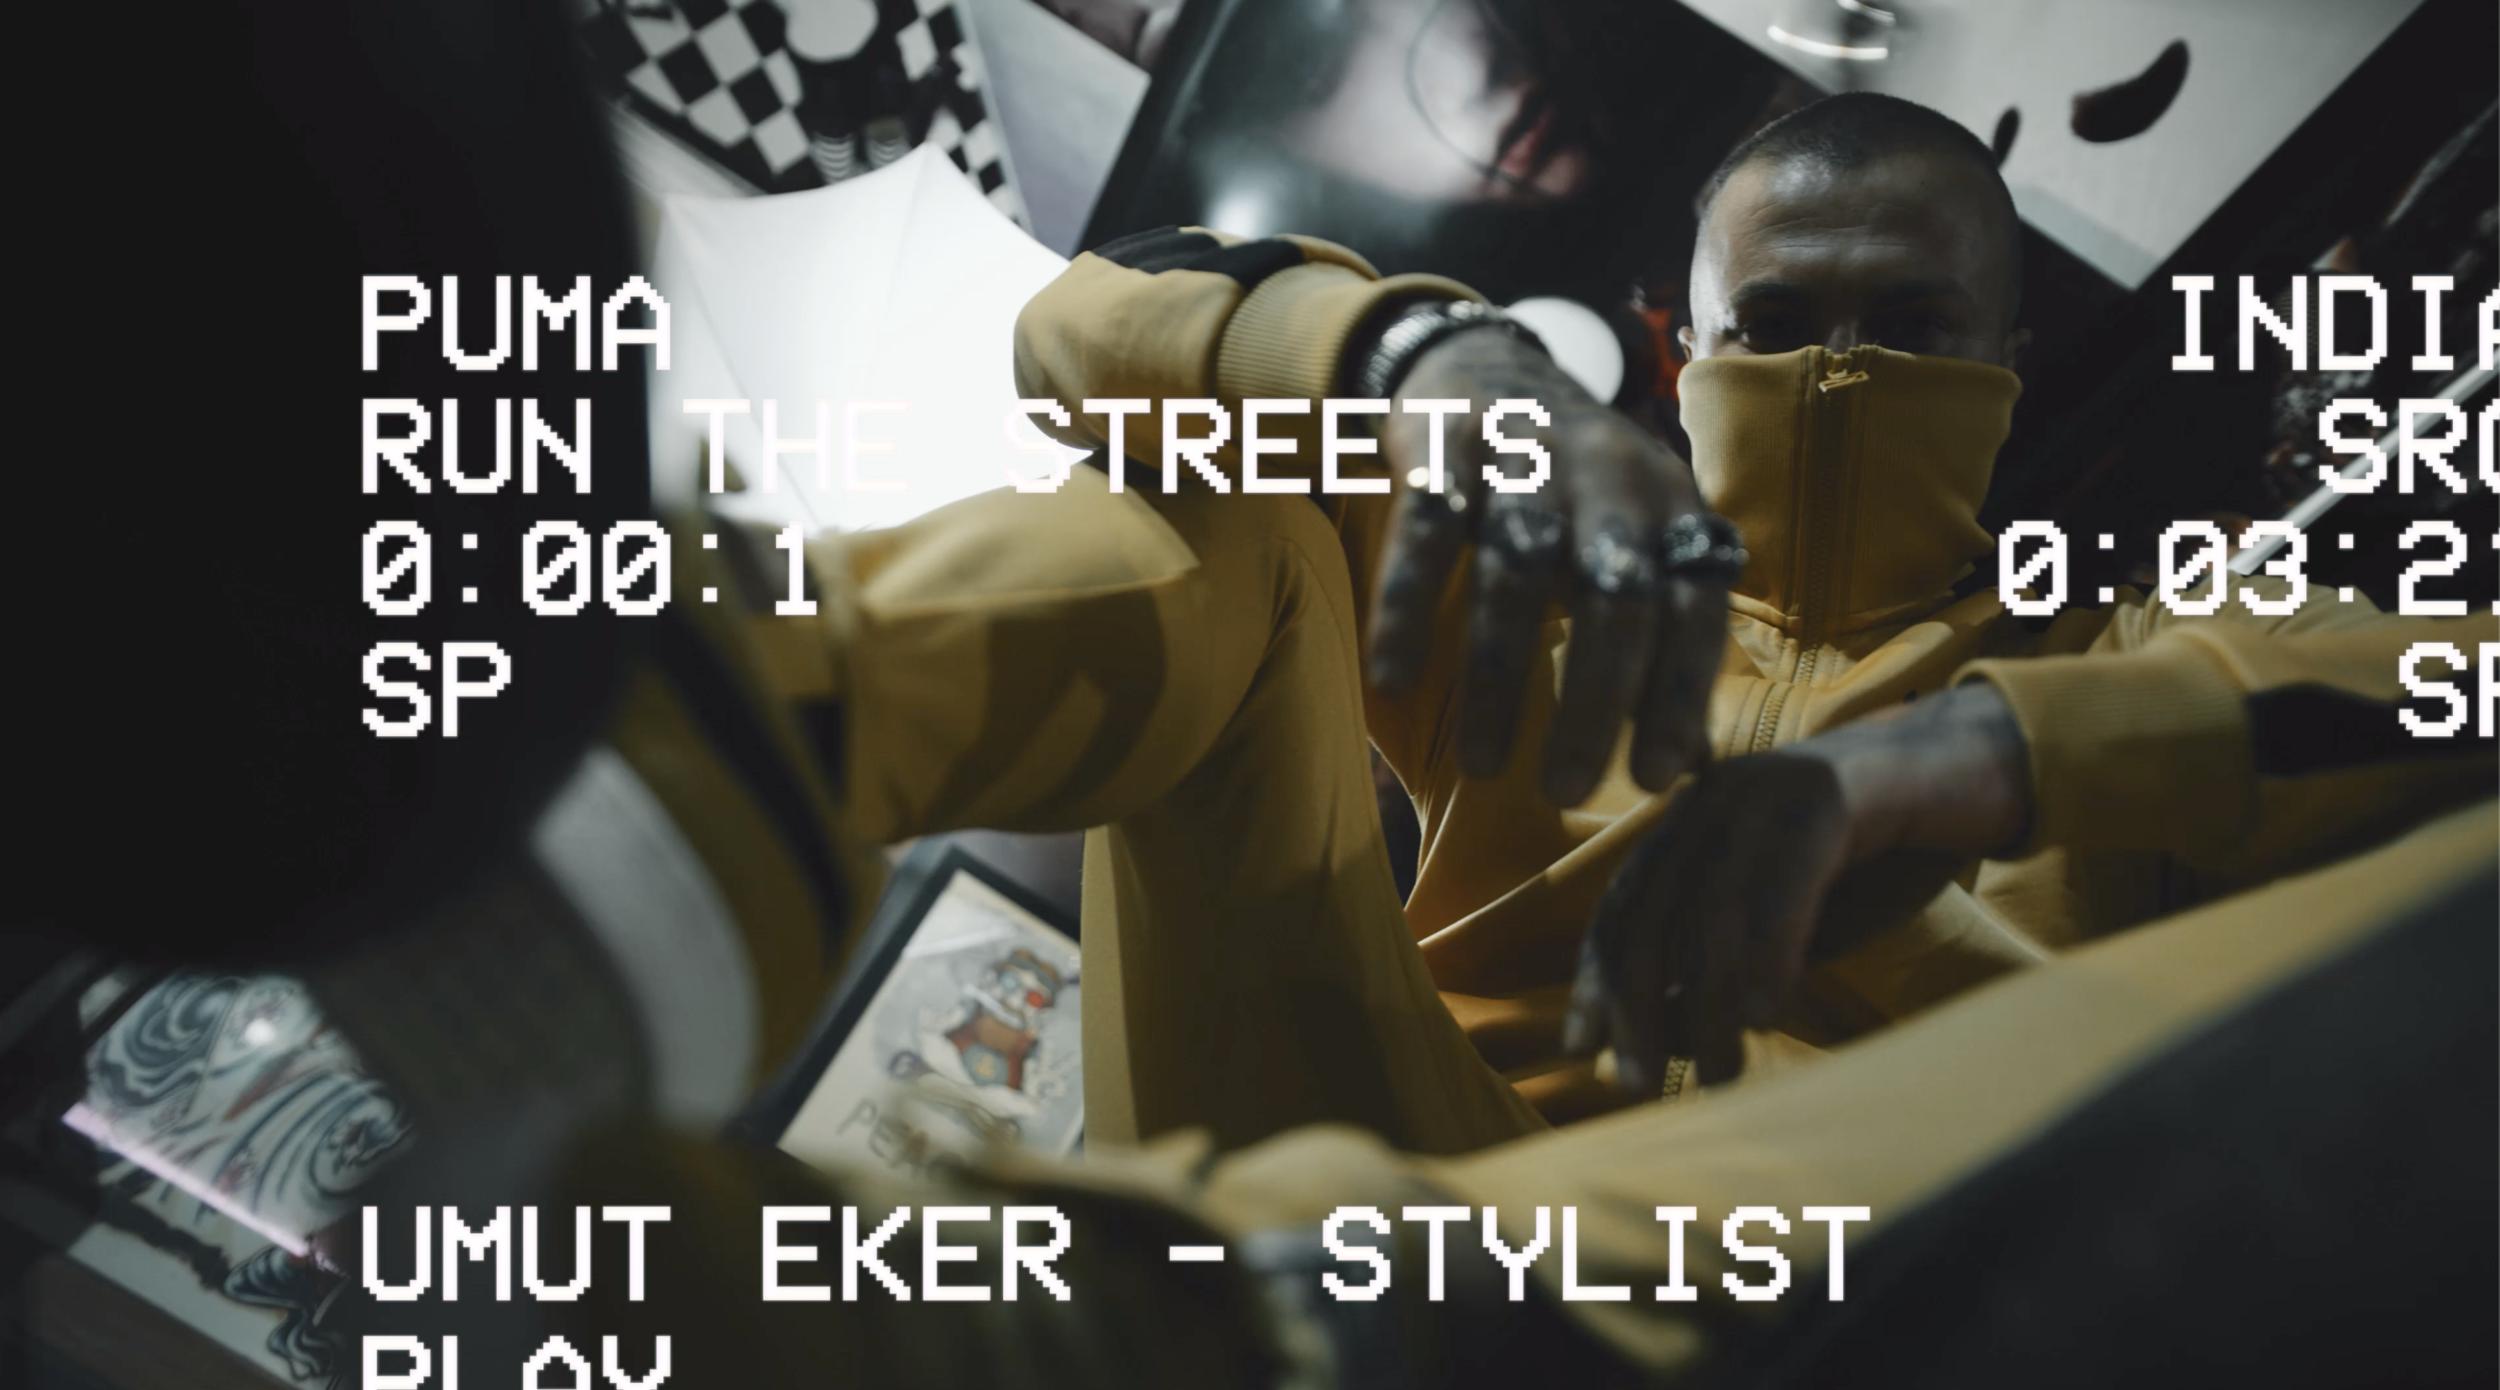 PUMA/ Run The Streets 2018